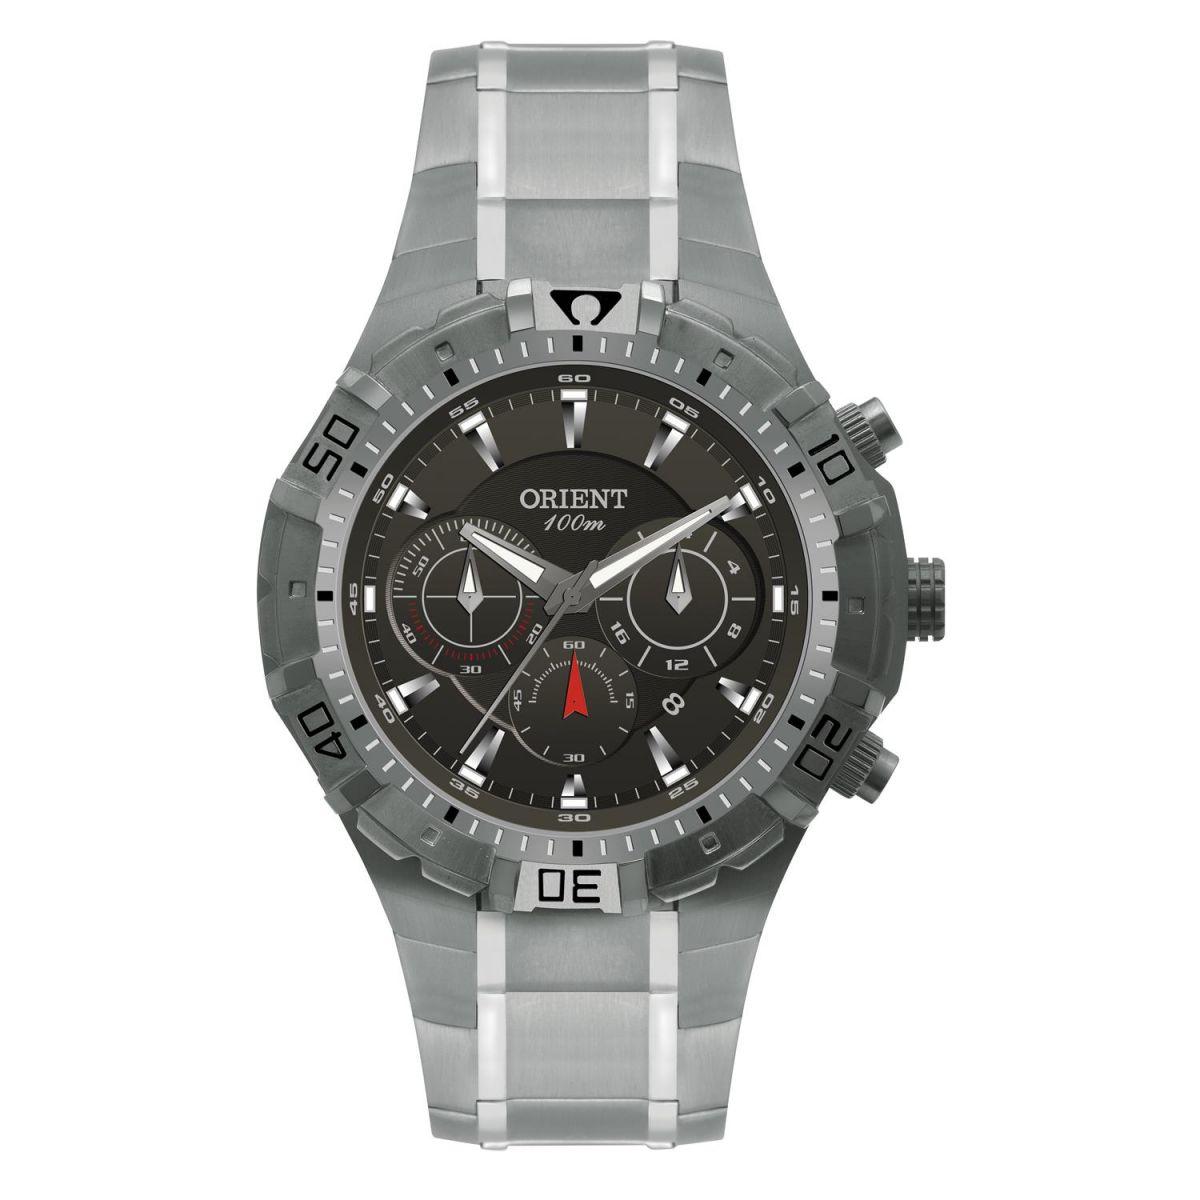 4c6f01dd1f8 Relógio Orient Masculino Ref  Mbttc005 G1gx Flytech